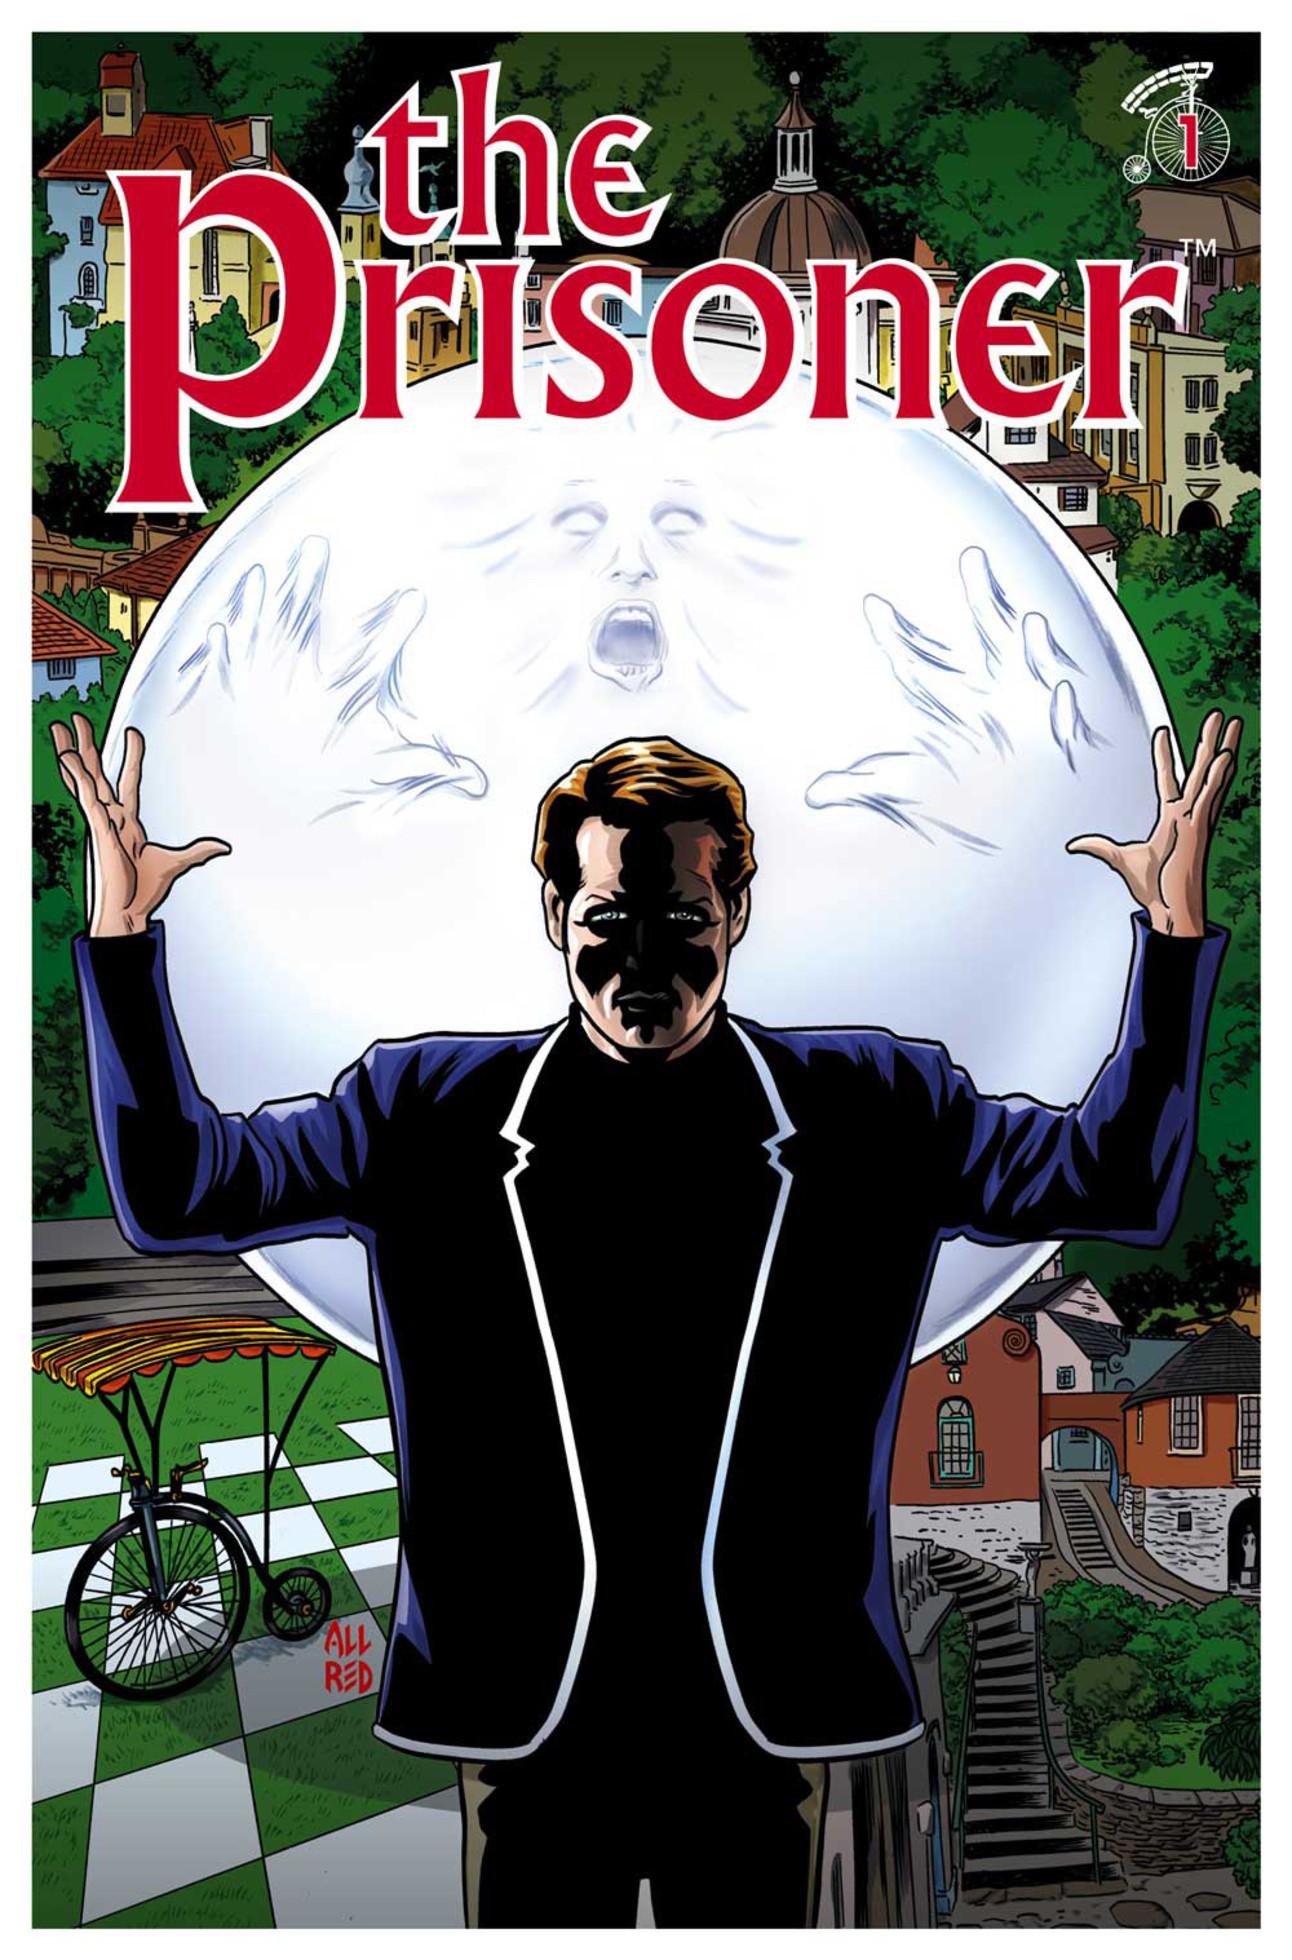 titan_the_prisoner_1_cover.jpg